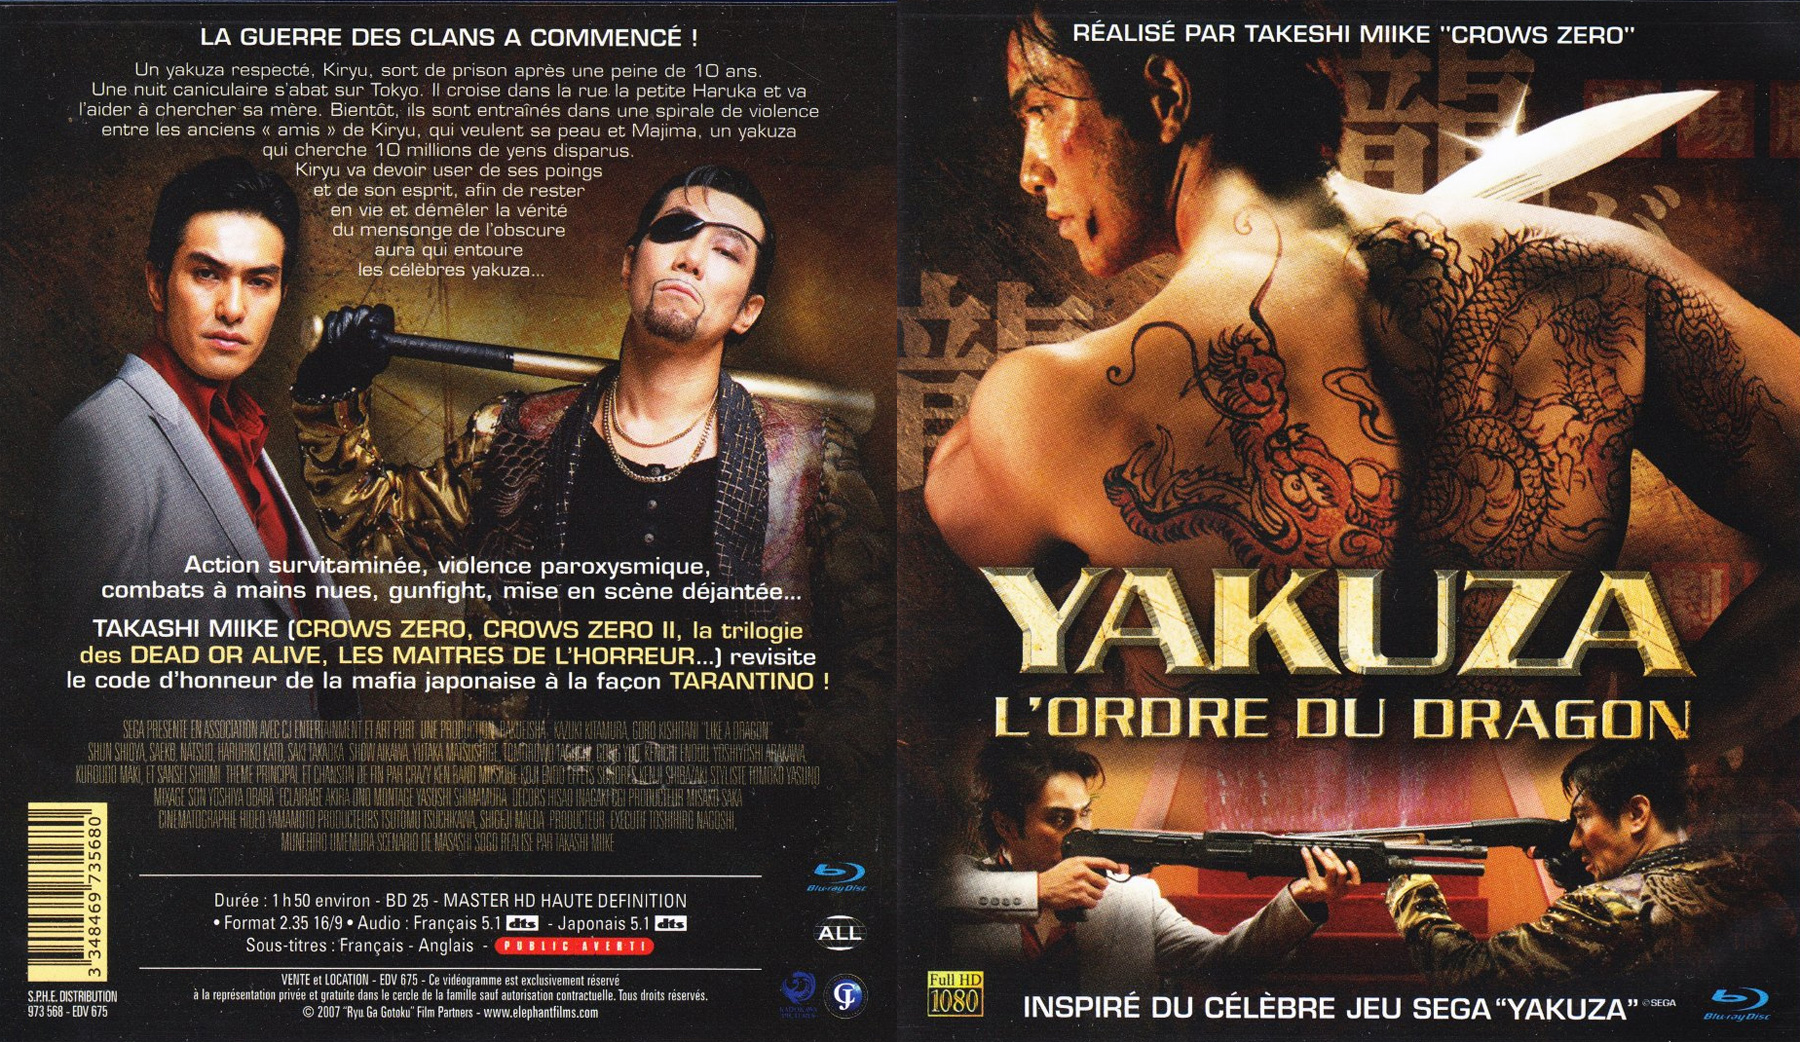 http://img.affenheimtheater.de/cover_br/cover_yakuza_like_a_dragon_fr.jpg